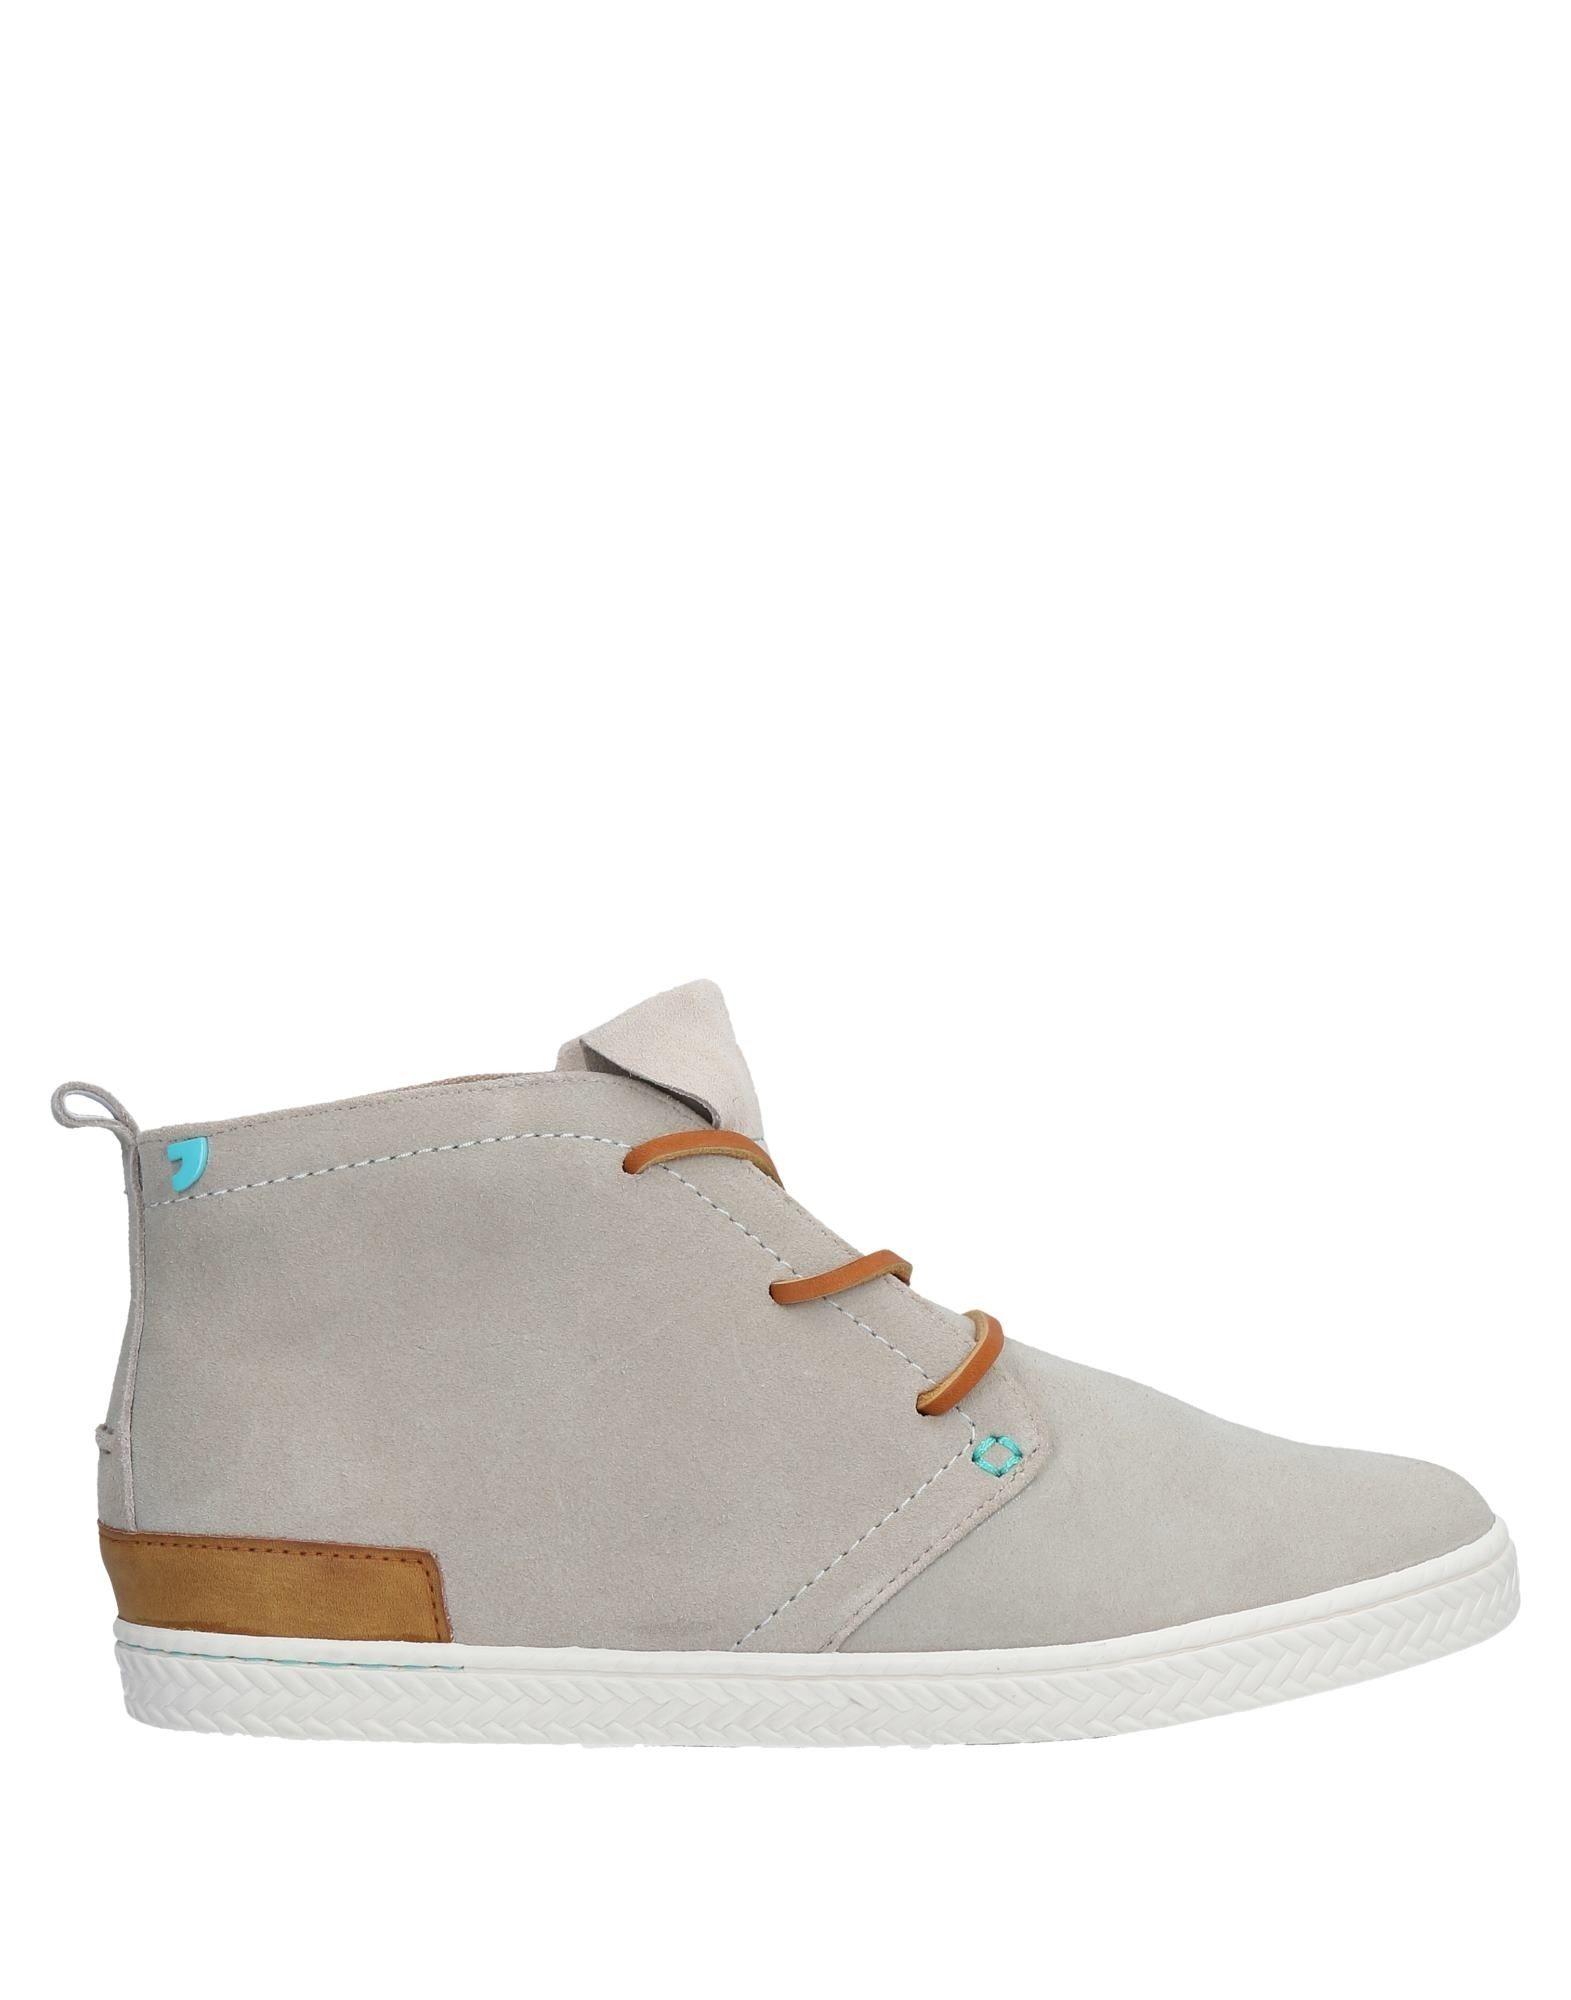 Gioseppo on Boots - Men Gioseppo Boots online on Gioseppo  Canada - 11574483NX 2be4e1